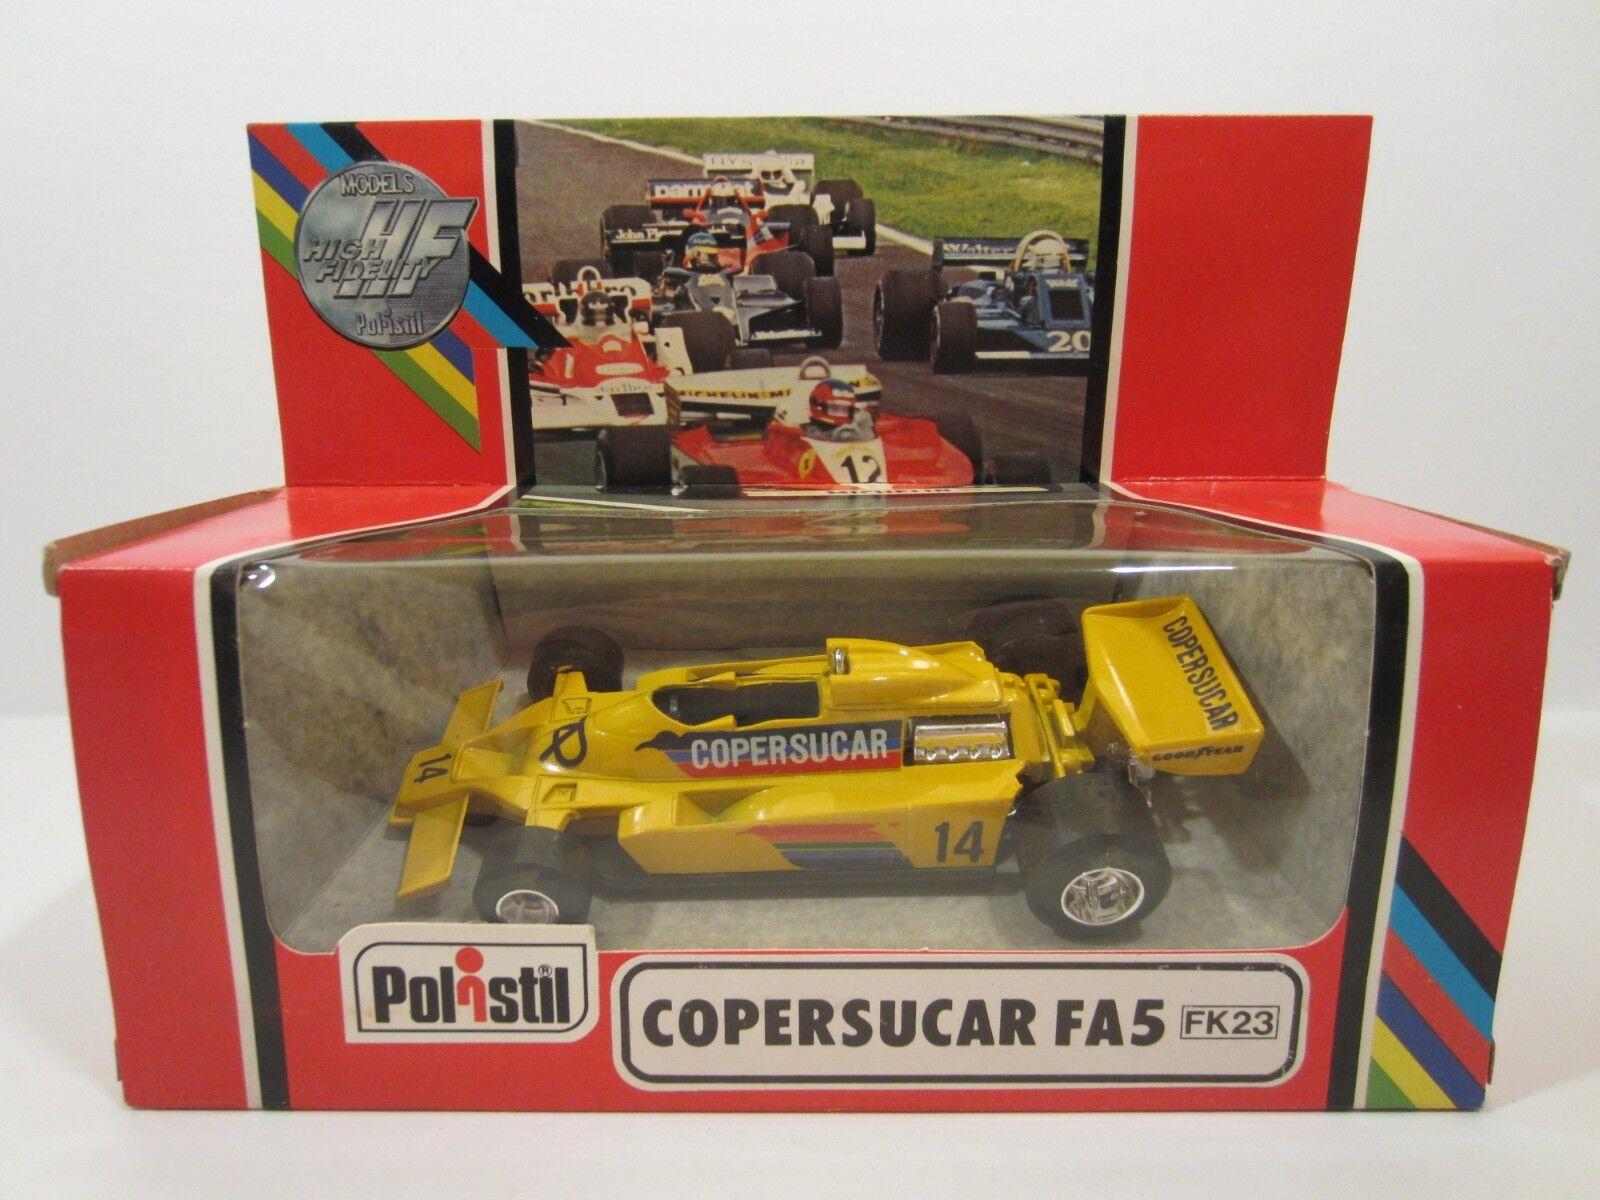 POLISTIL POLITOYS - COPERSUCAR - F1 F5A N 14 1978 E.FITTIPALDI - CODE: FK23 -NEW